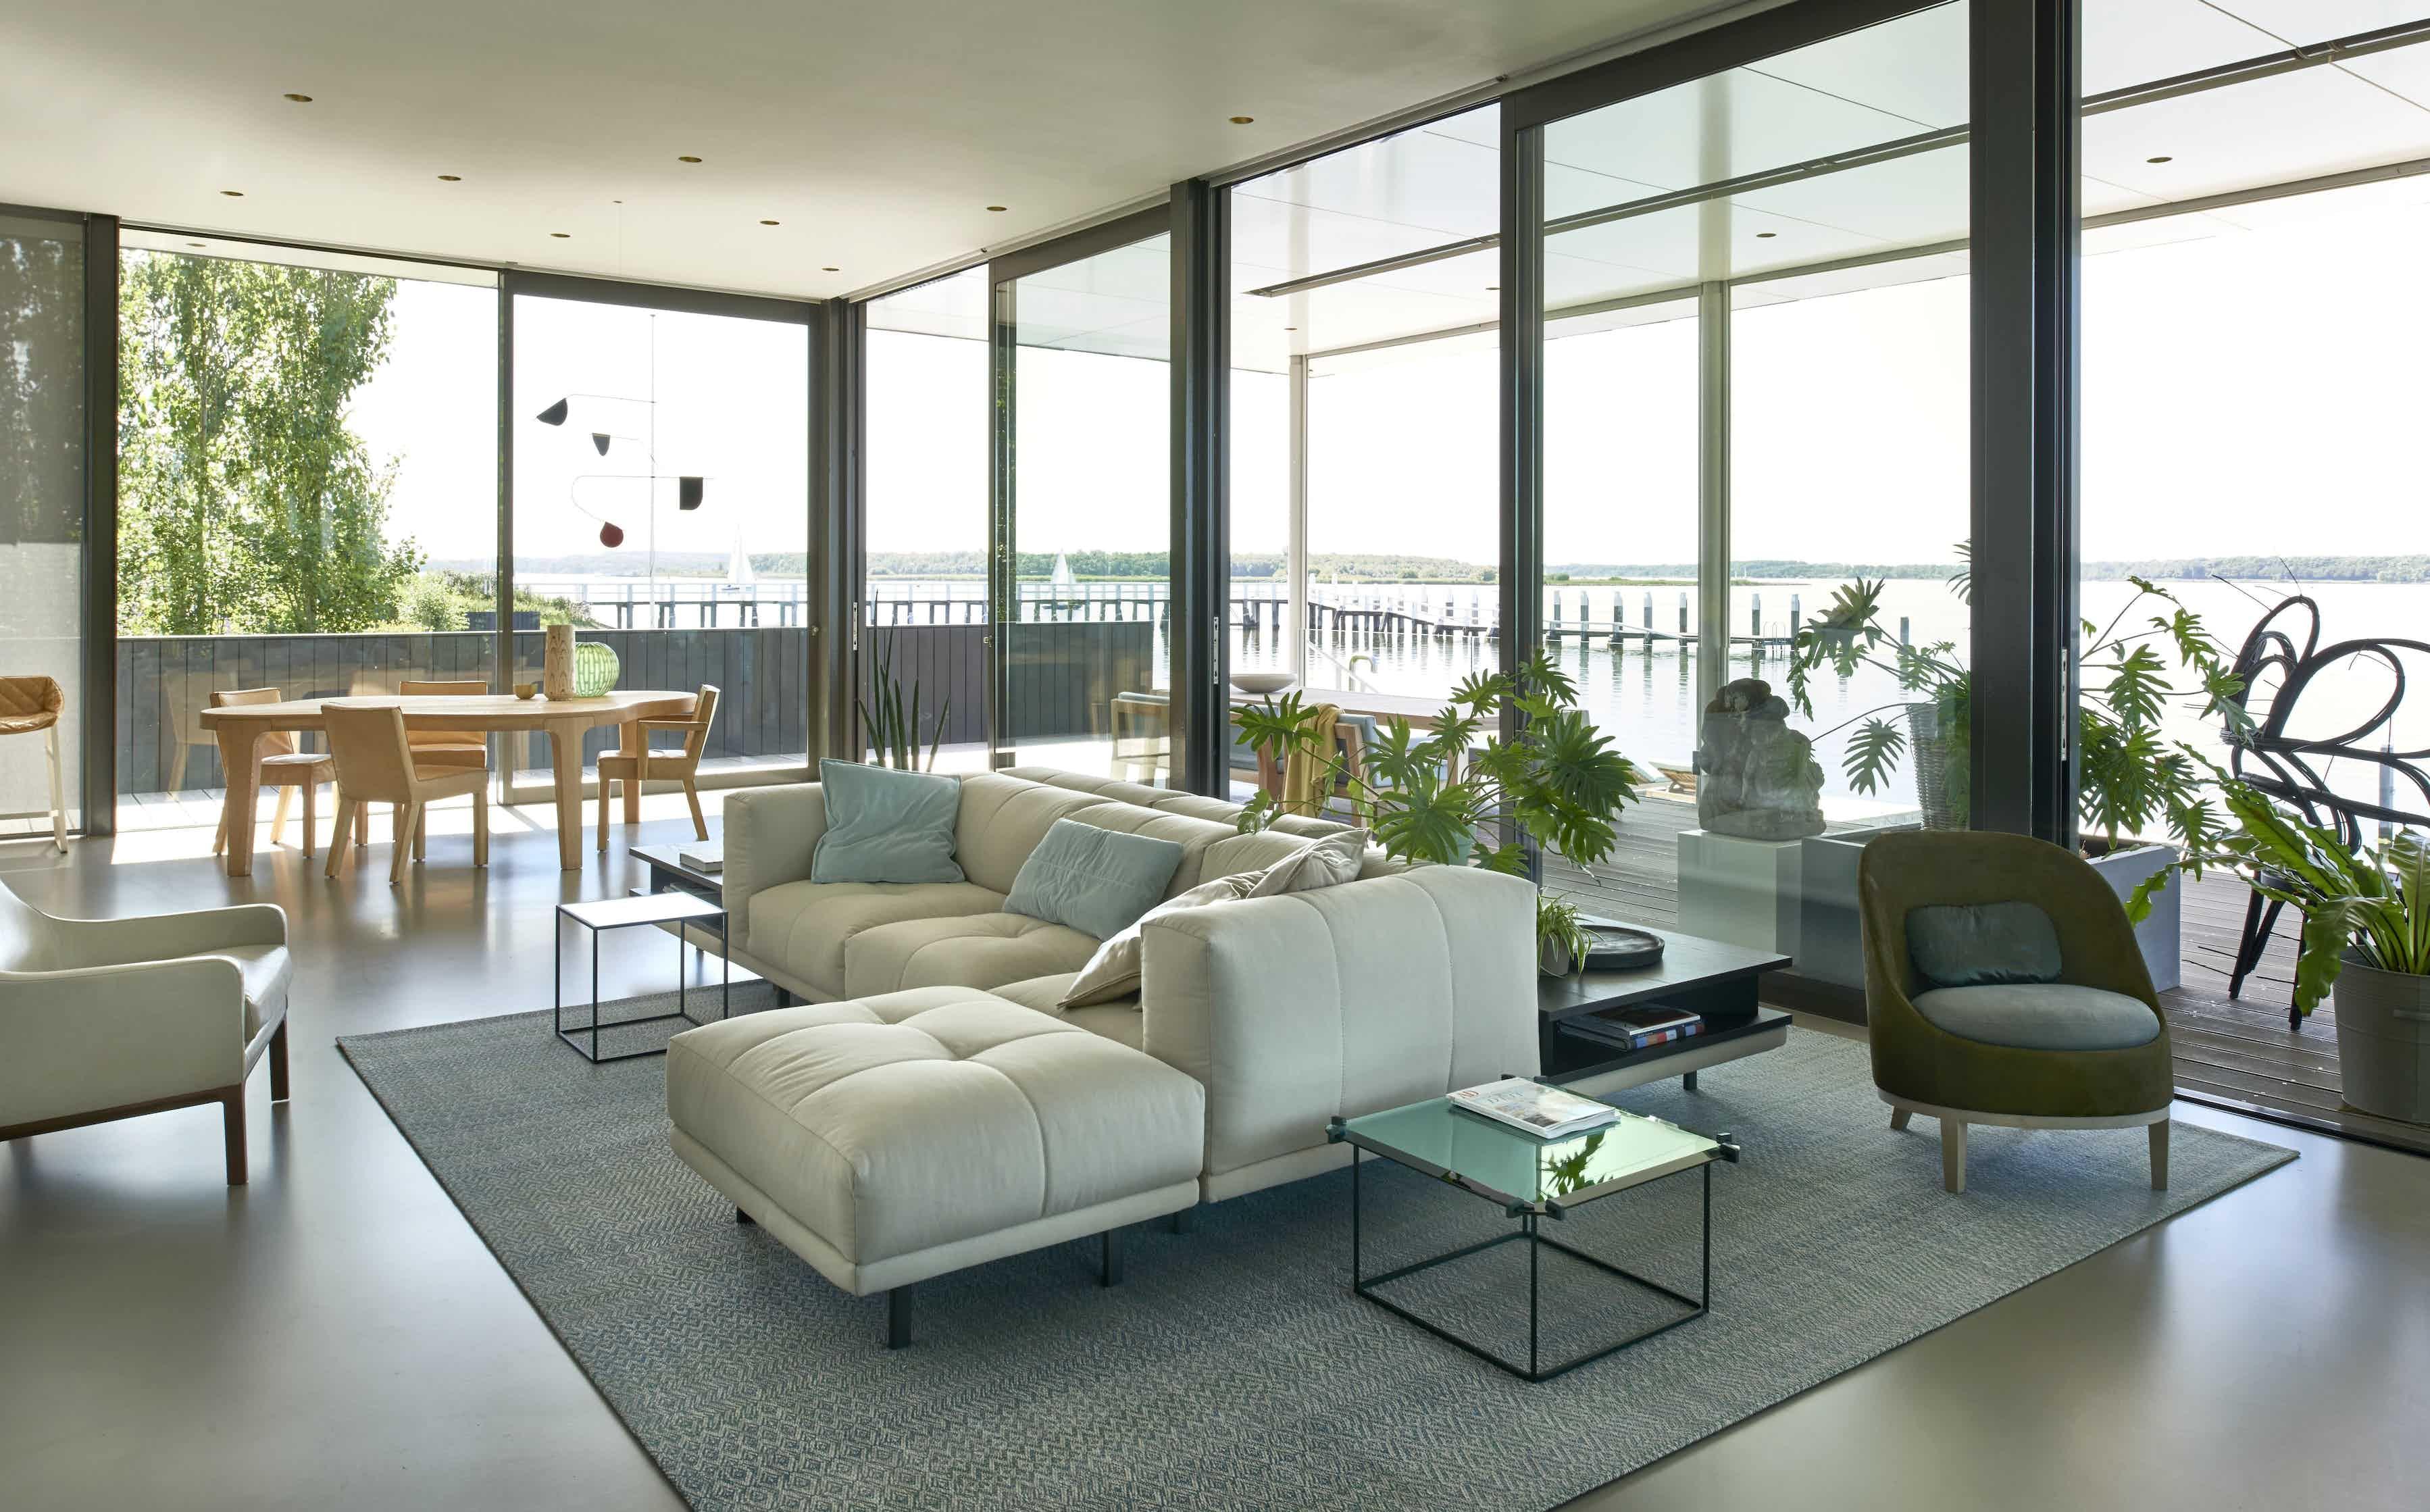 Linteloo-desire-armchair-institu-haute-living